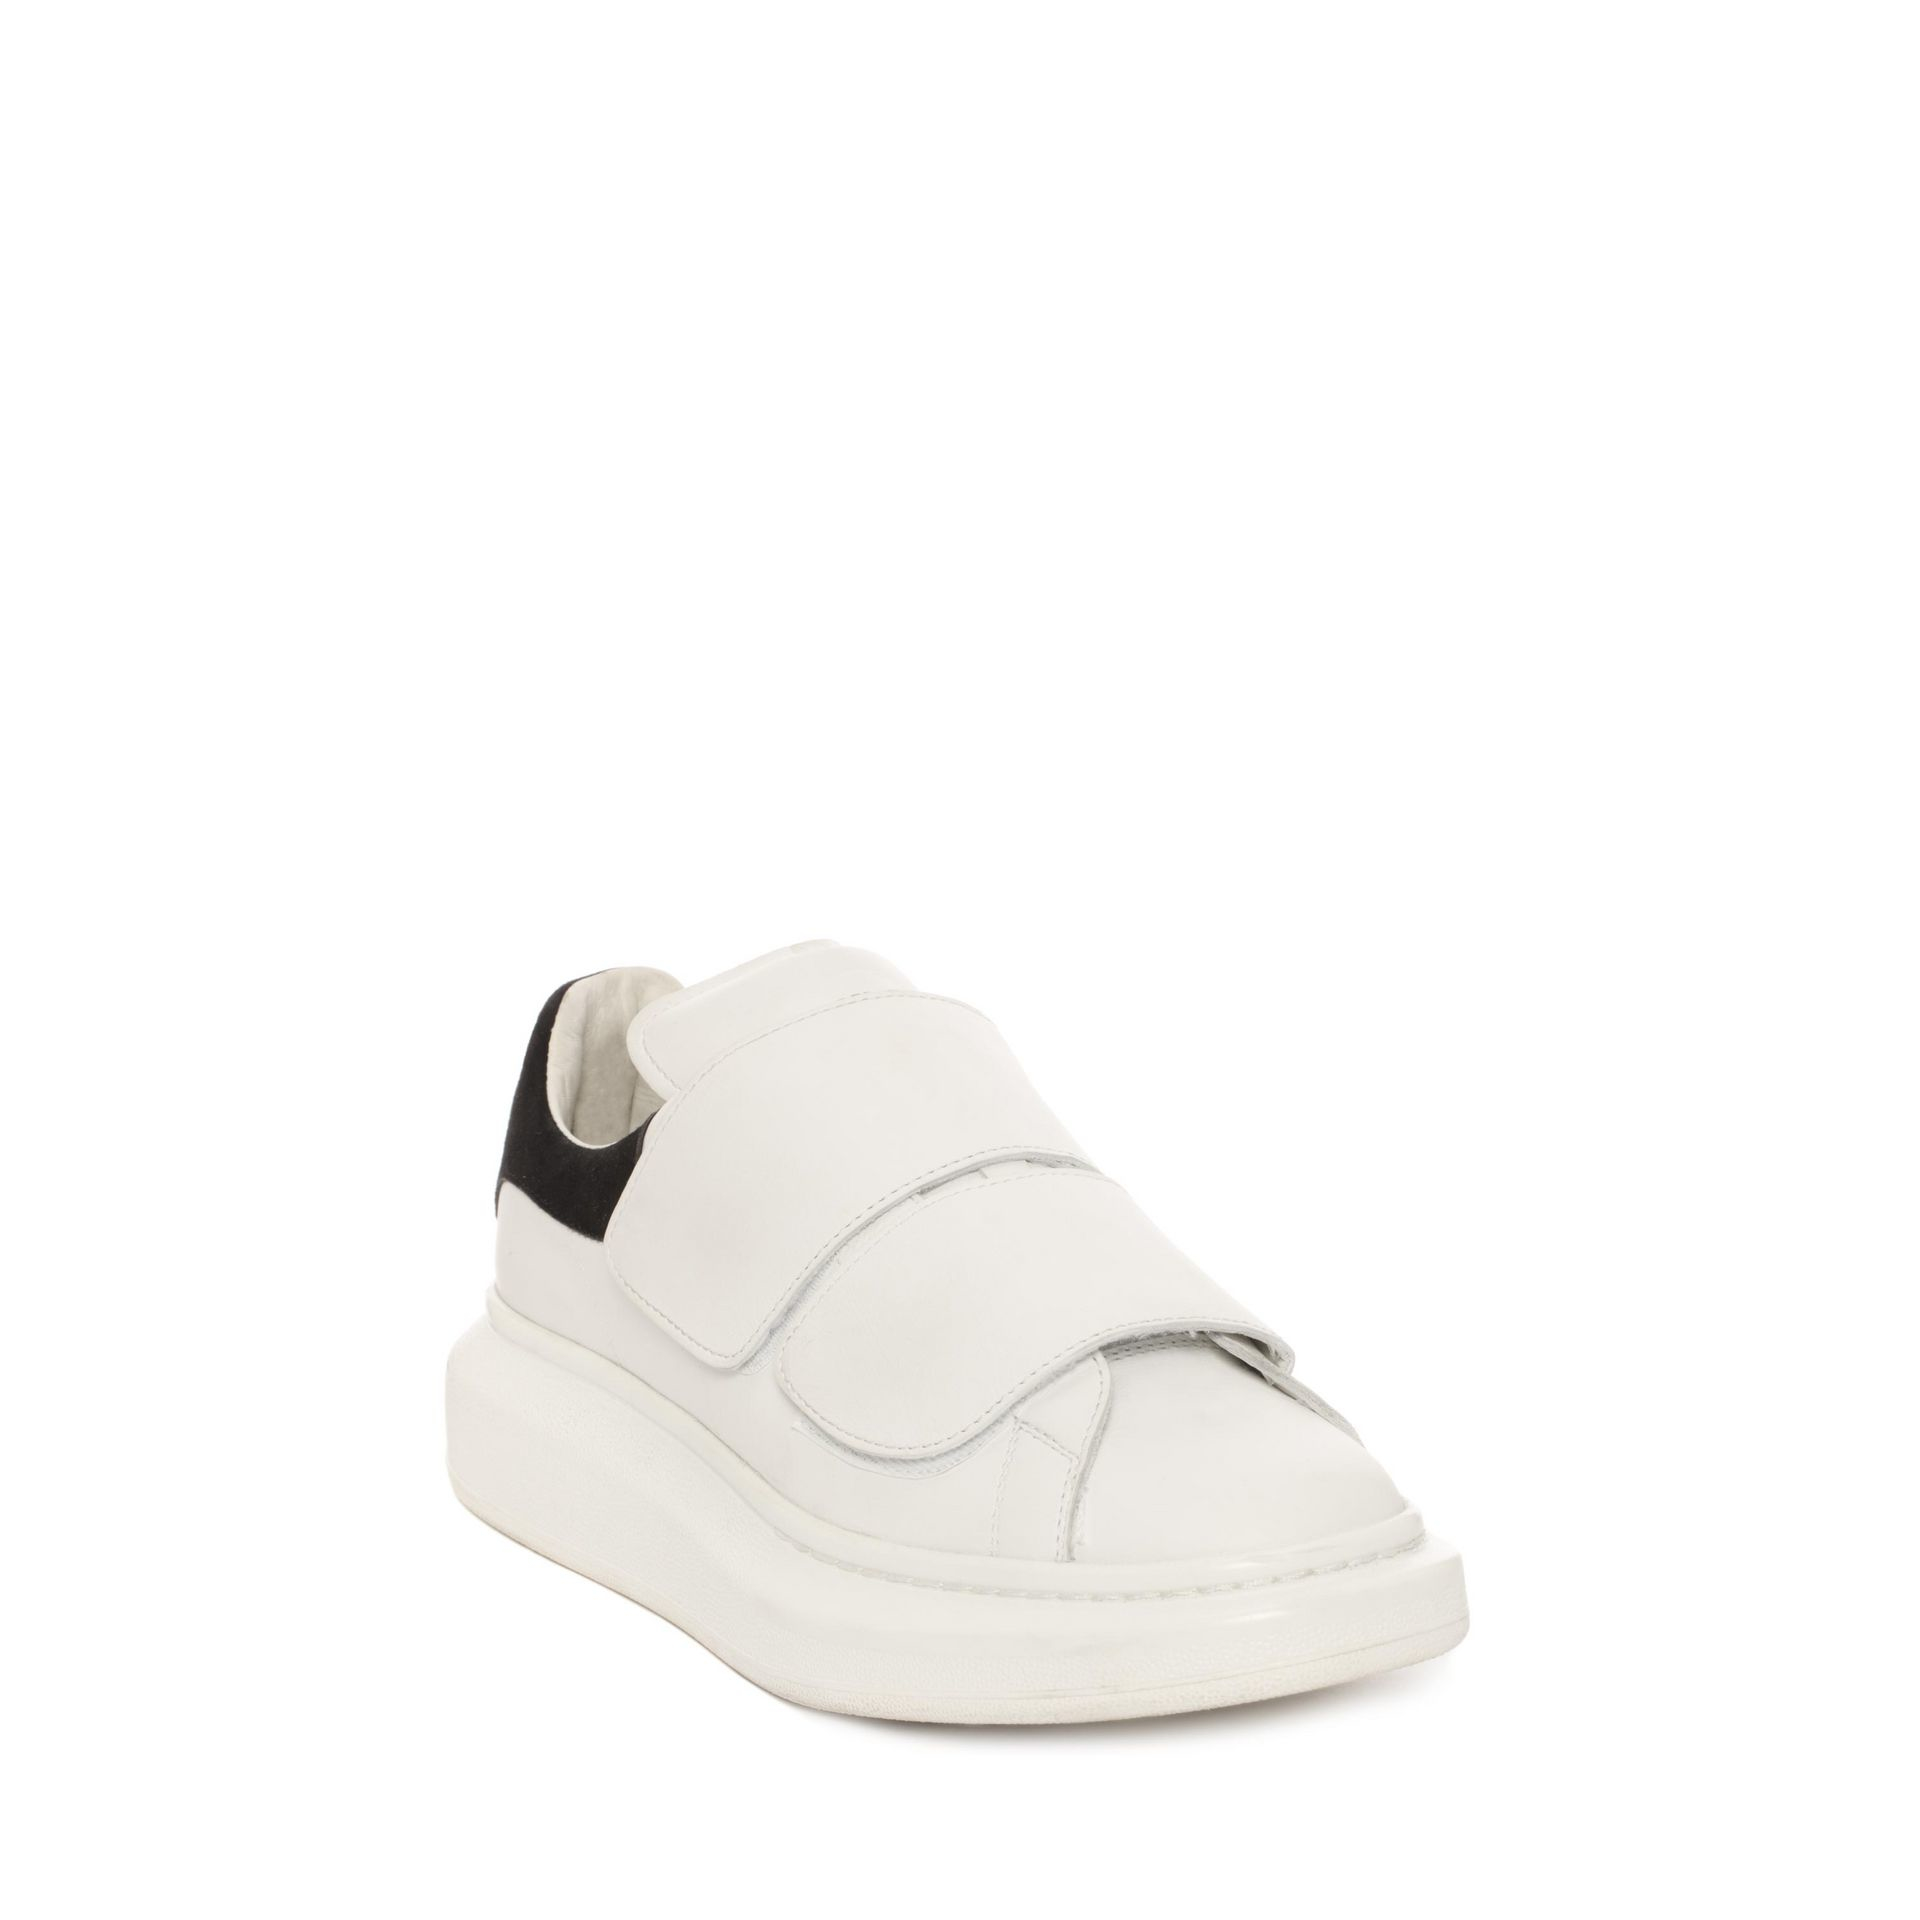 alexander mcqueen strap shoes off 53